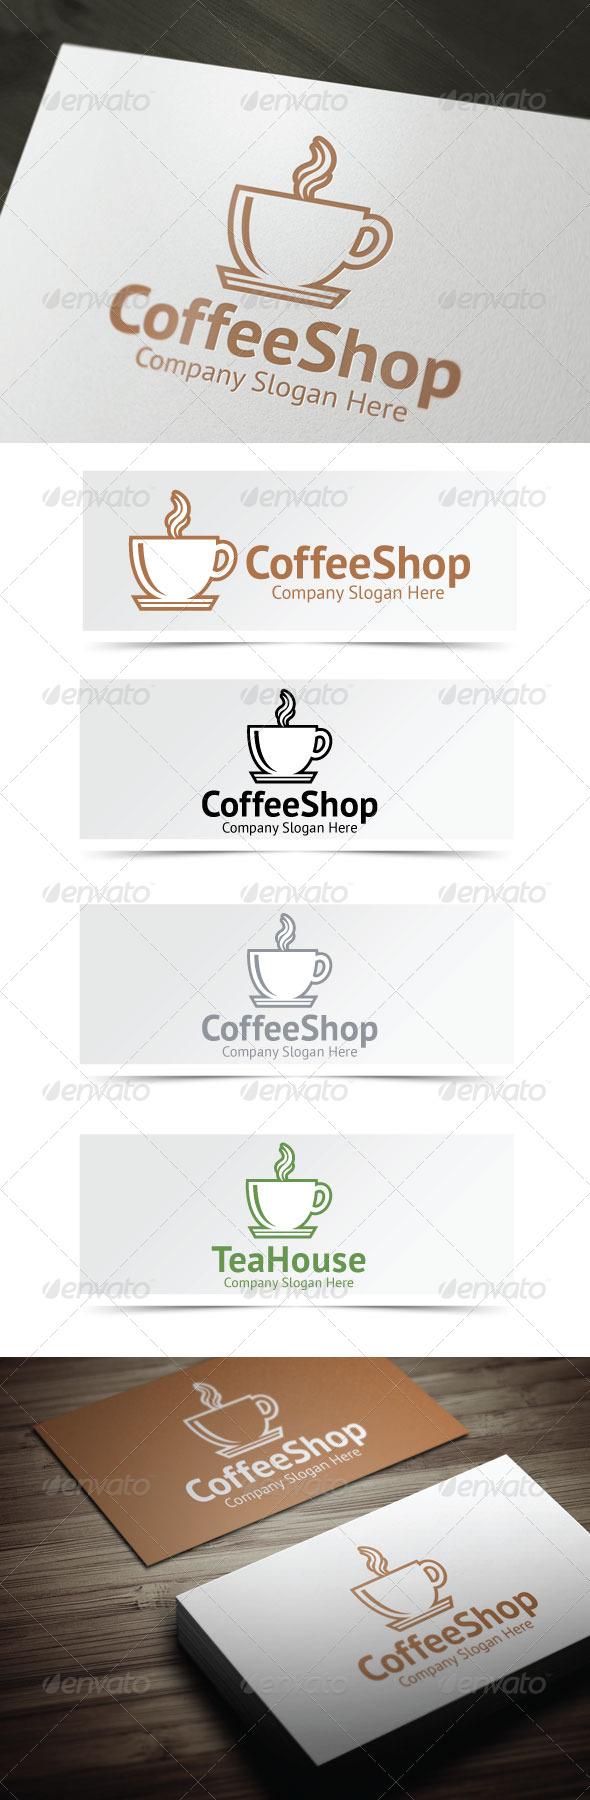 GraphicRiver Coffee Shop Logo 4060570